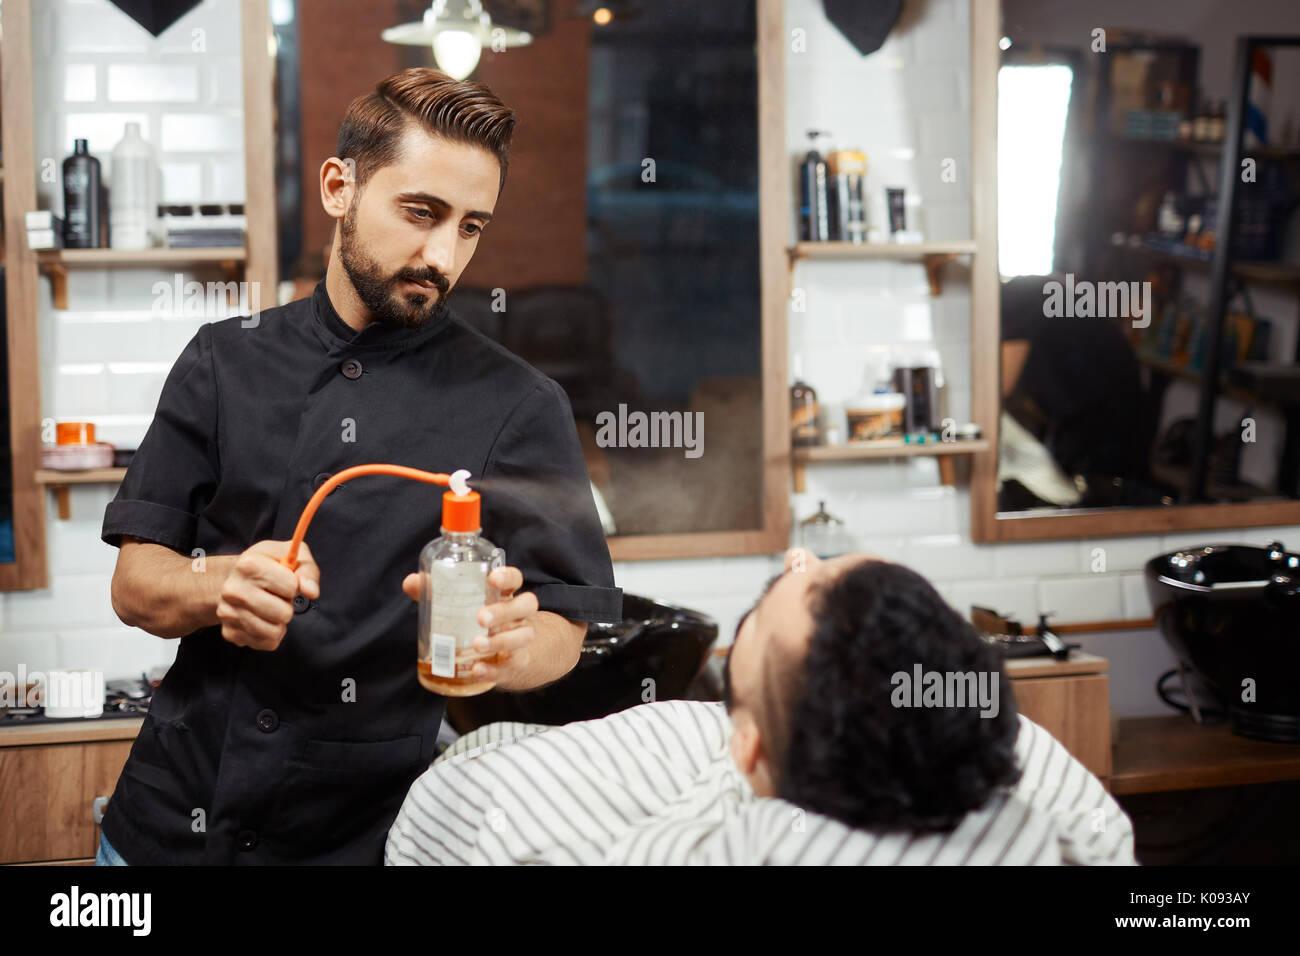 Friseur Verbreitung Parfüm auf dem Client Stockbild